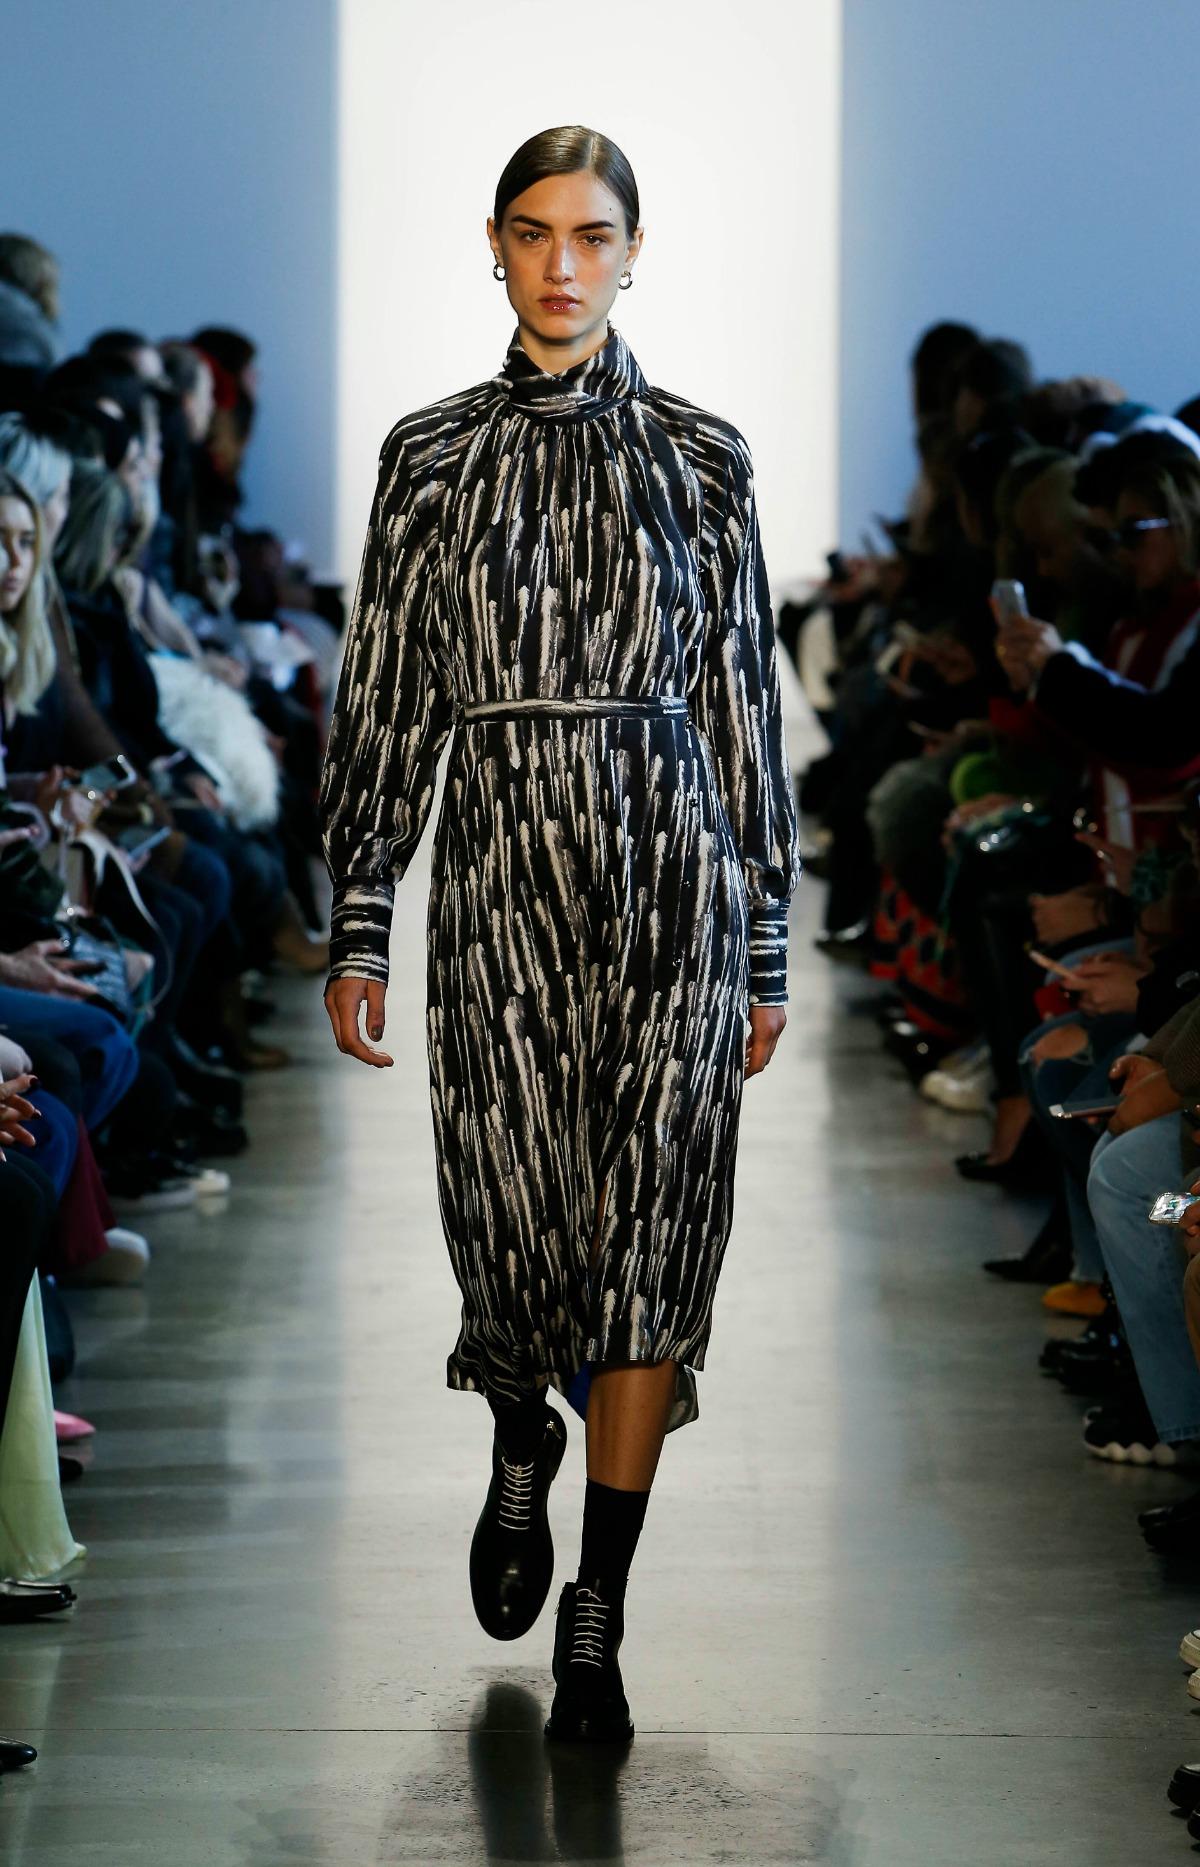 COLOVOS Fall 2018 Runway at NYFW I Silk Feather Print Dress #NYFW #WinterFashion